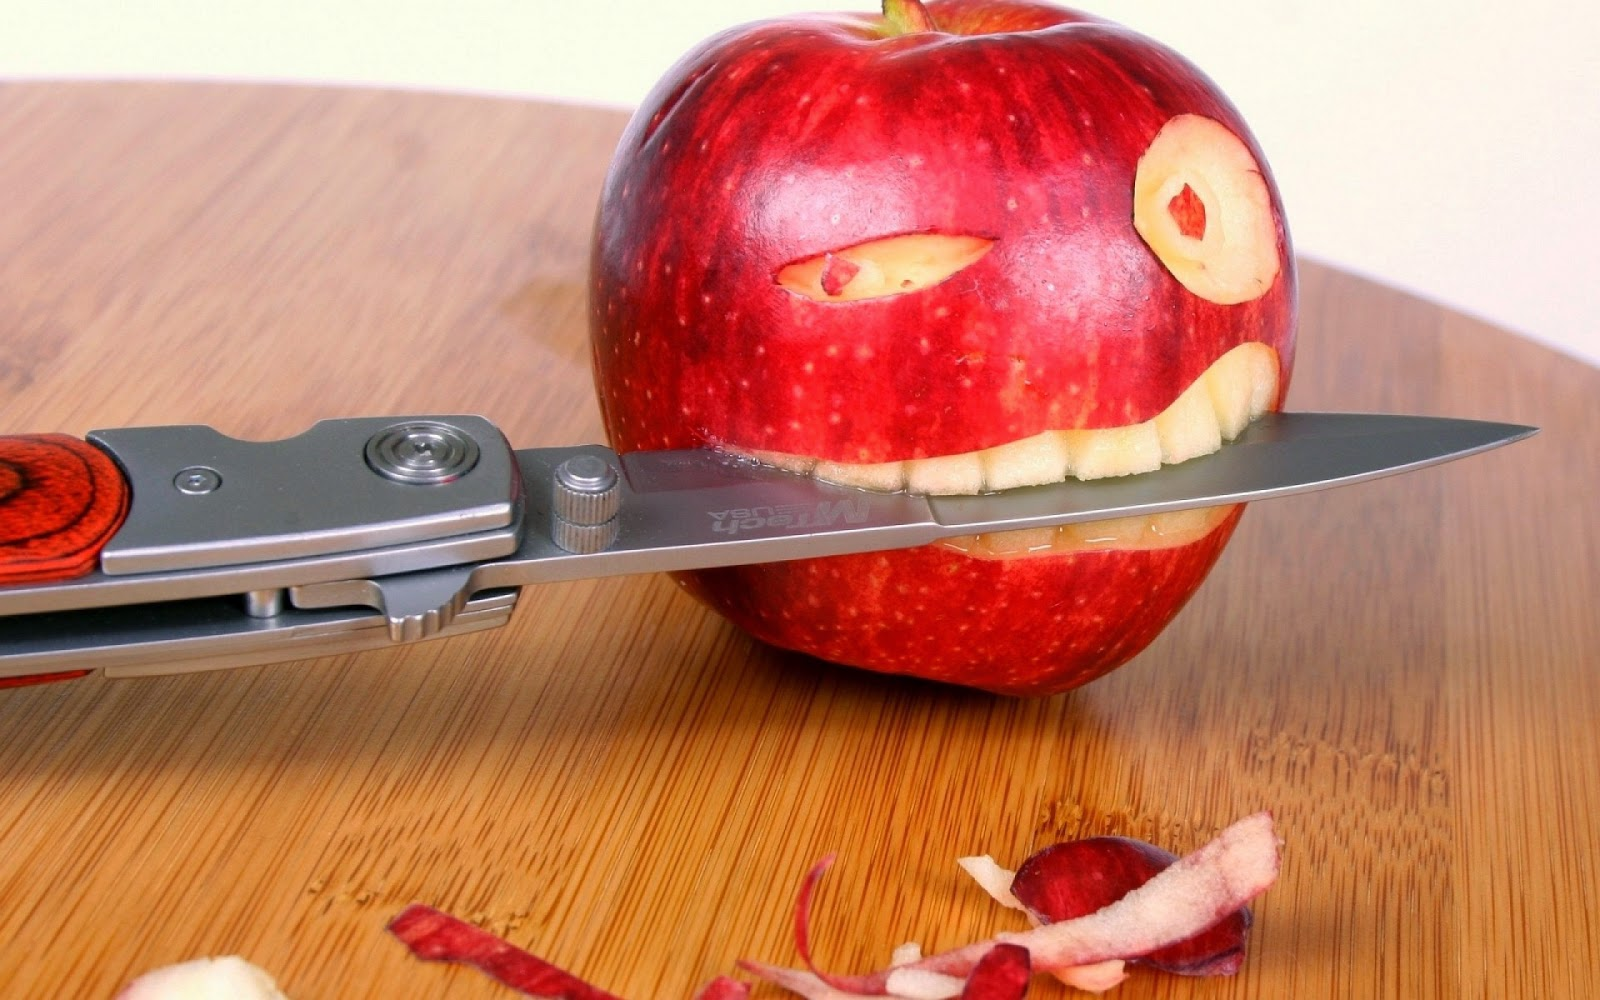 freehdwallpapershub: funny apple eating knife hd wallpaper